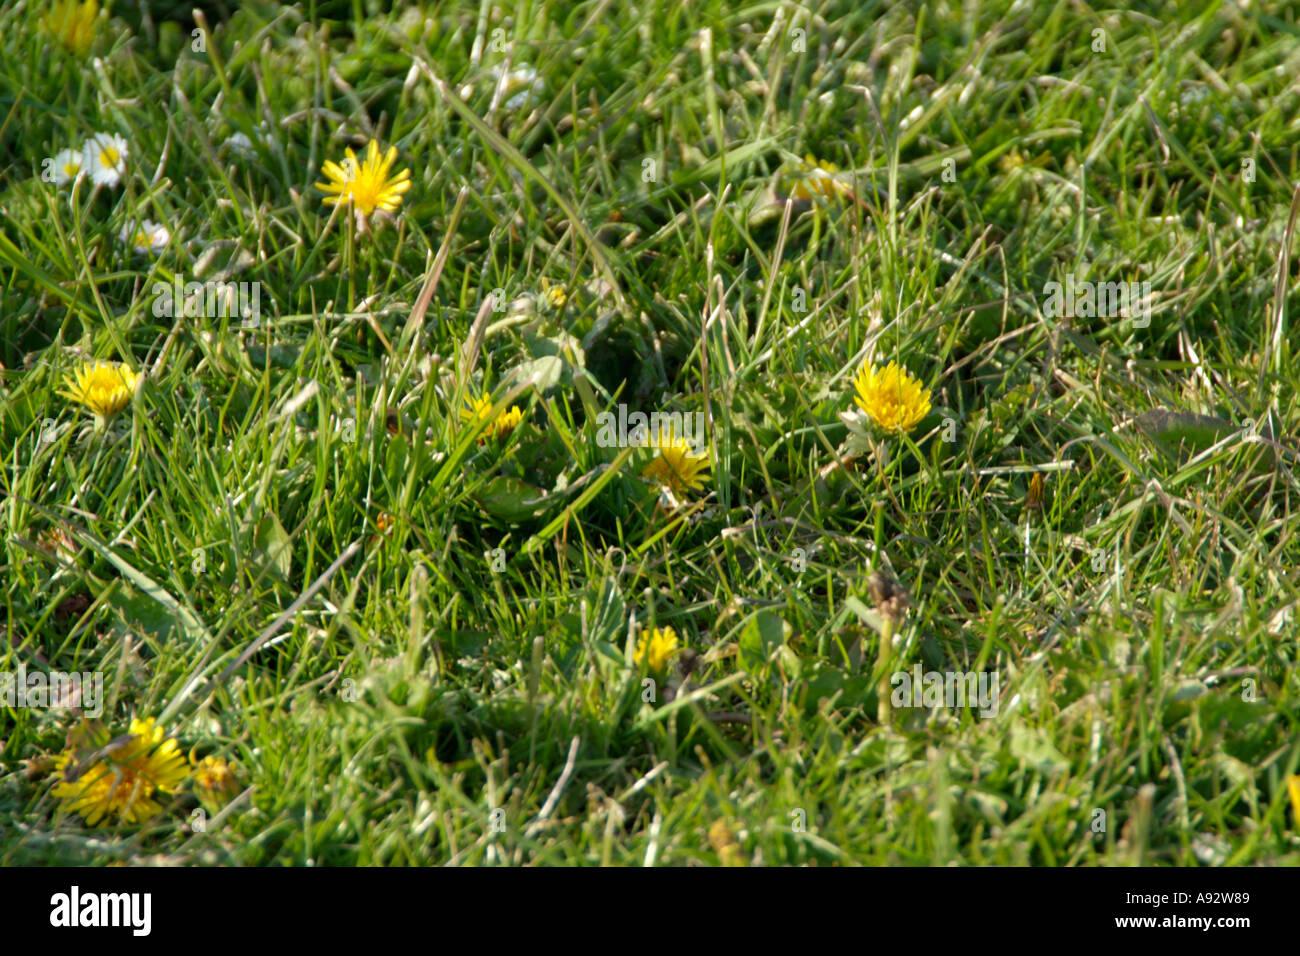 Dandylion Weed Weeds Grass Lawn Stock Photos Dandylion Weed Weeds